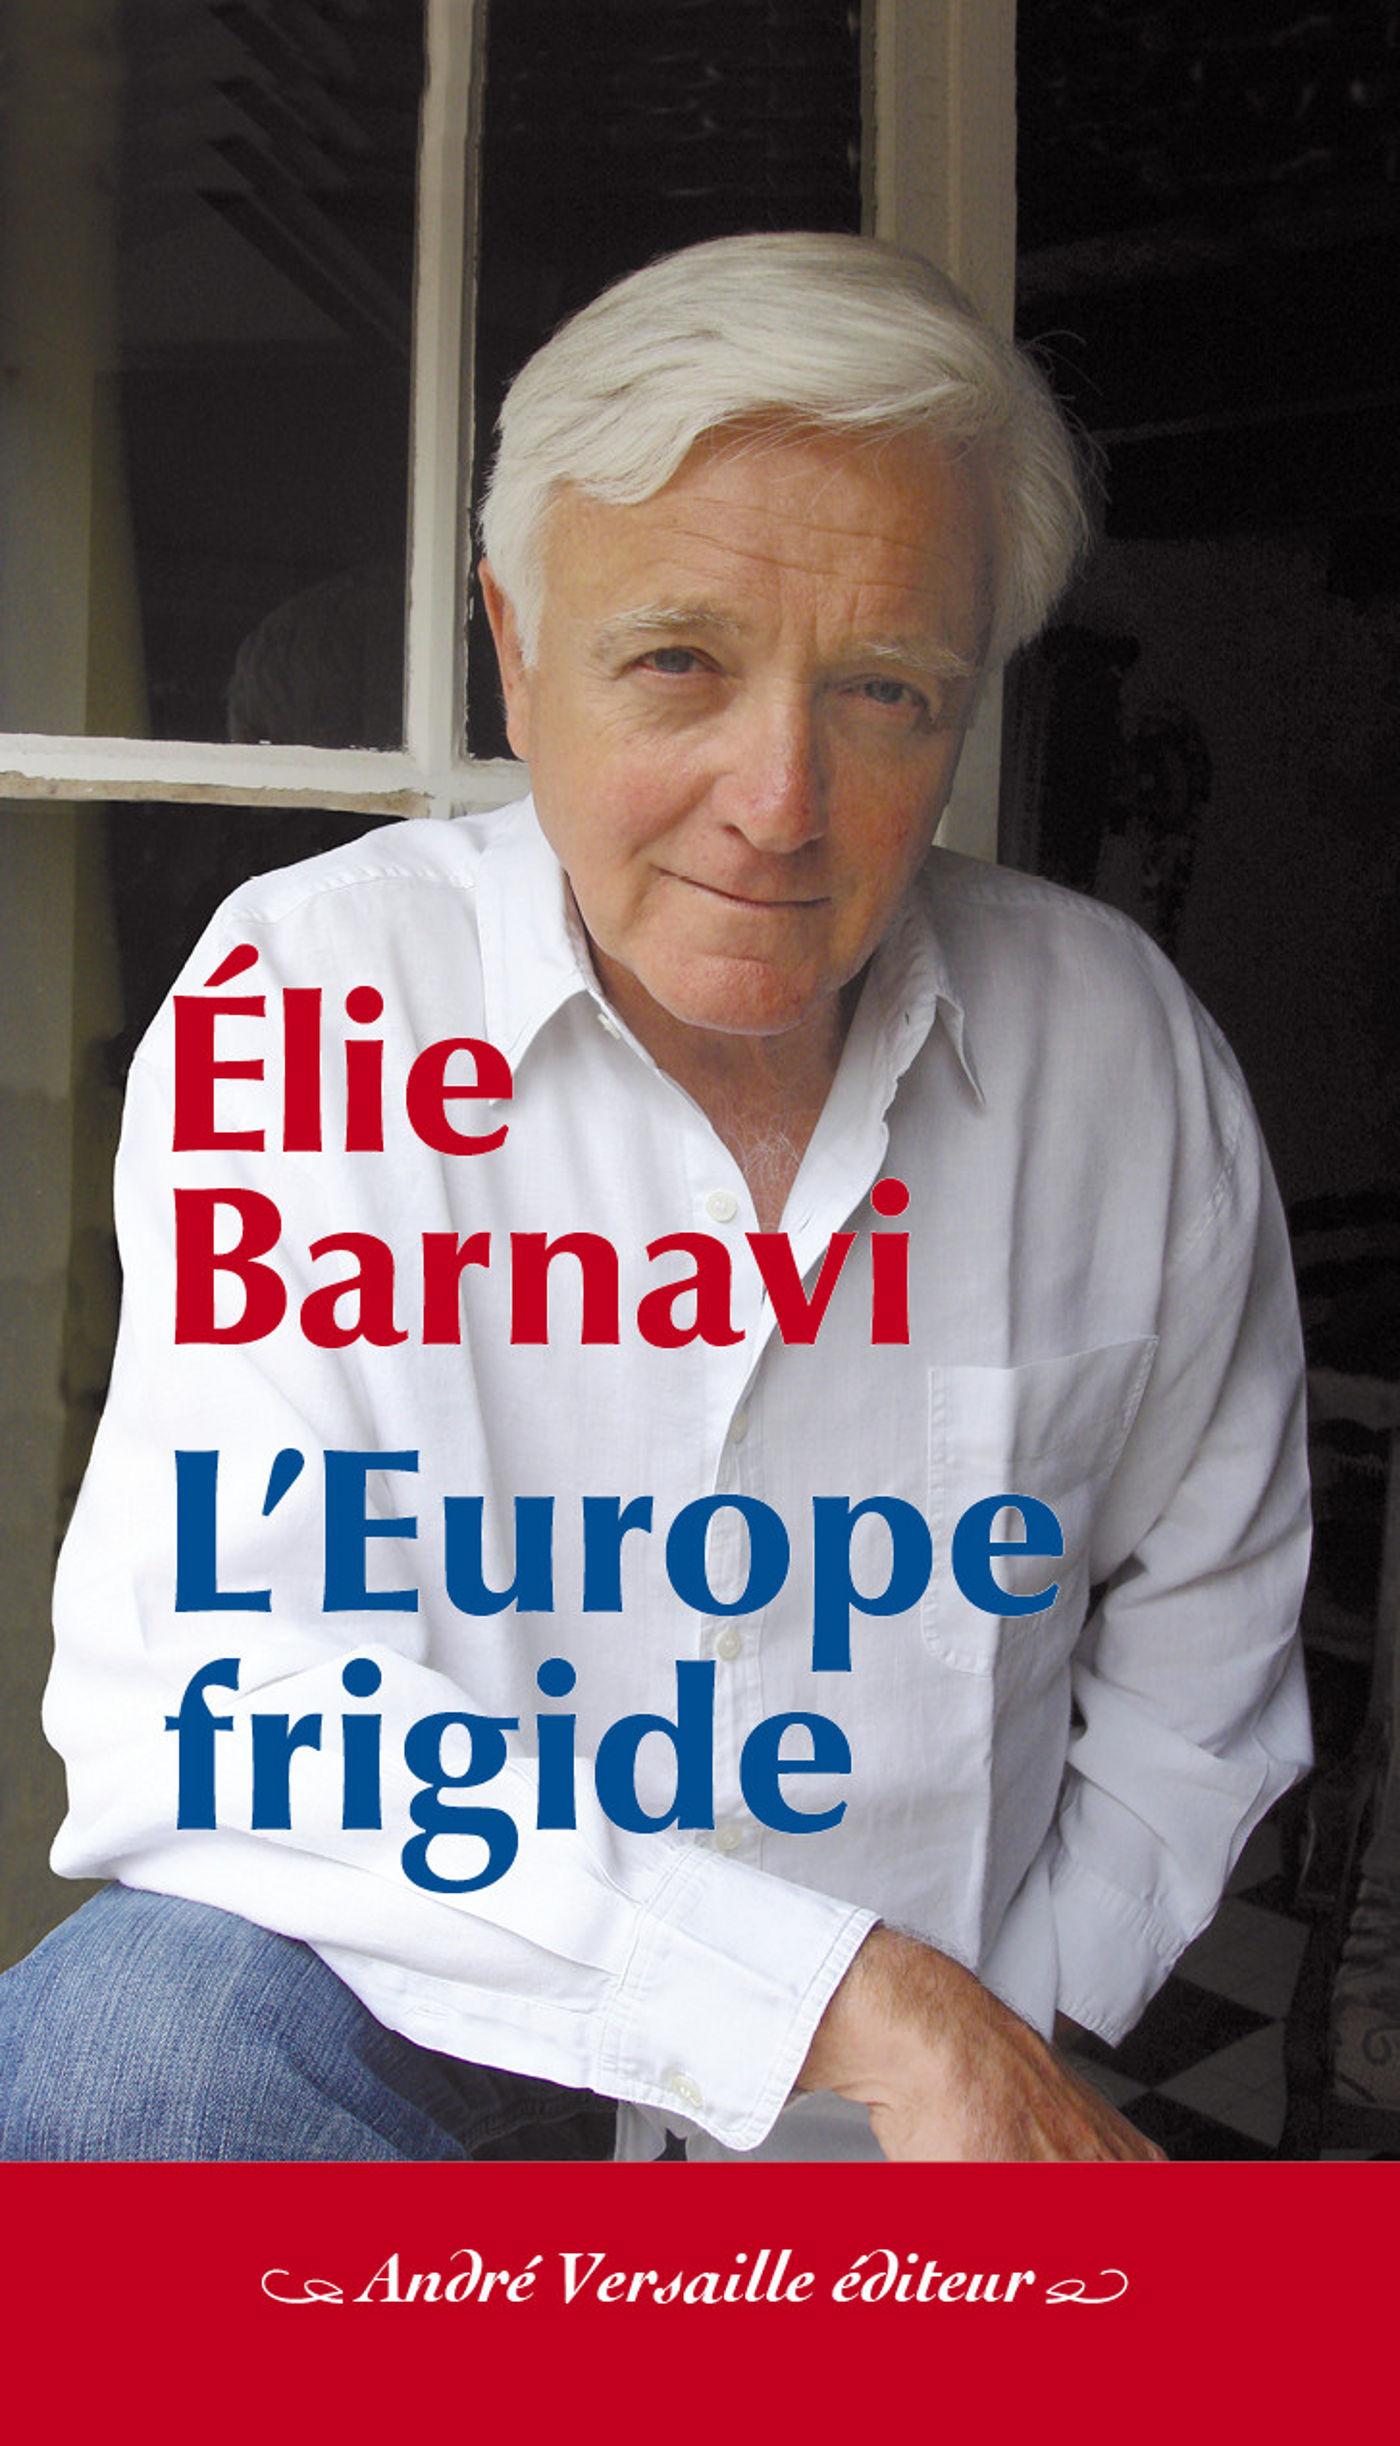 L'Europe frigide